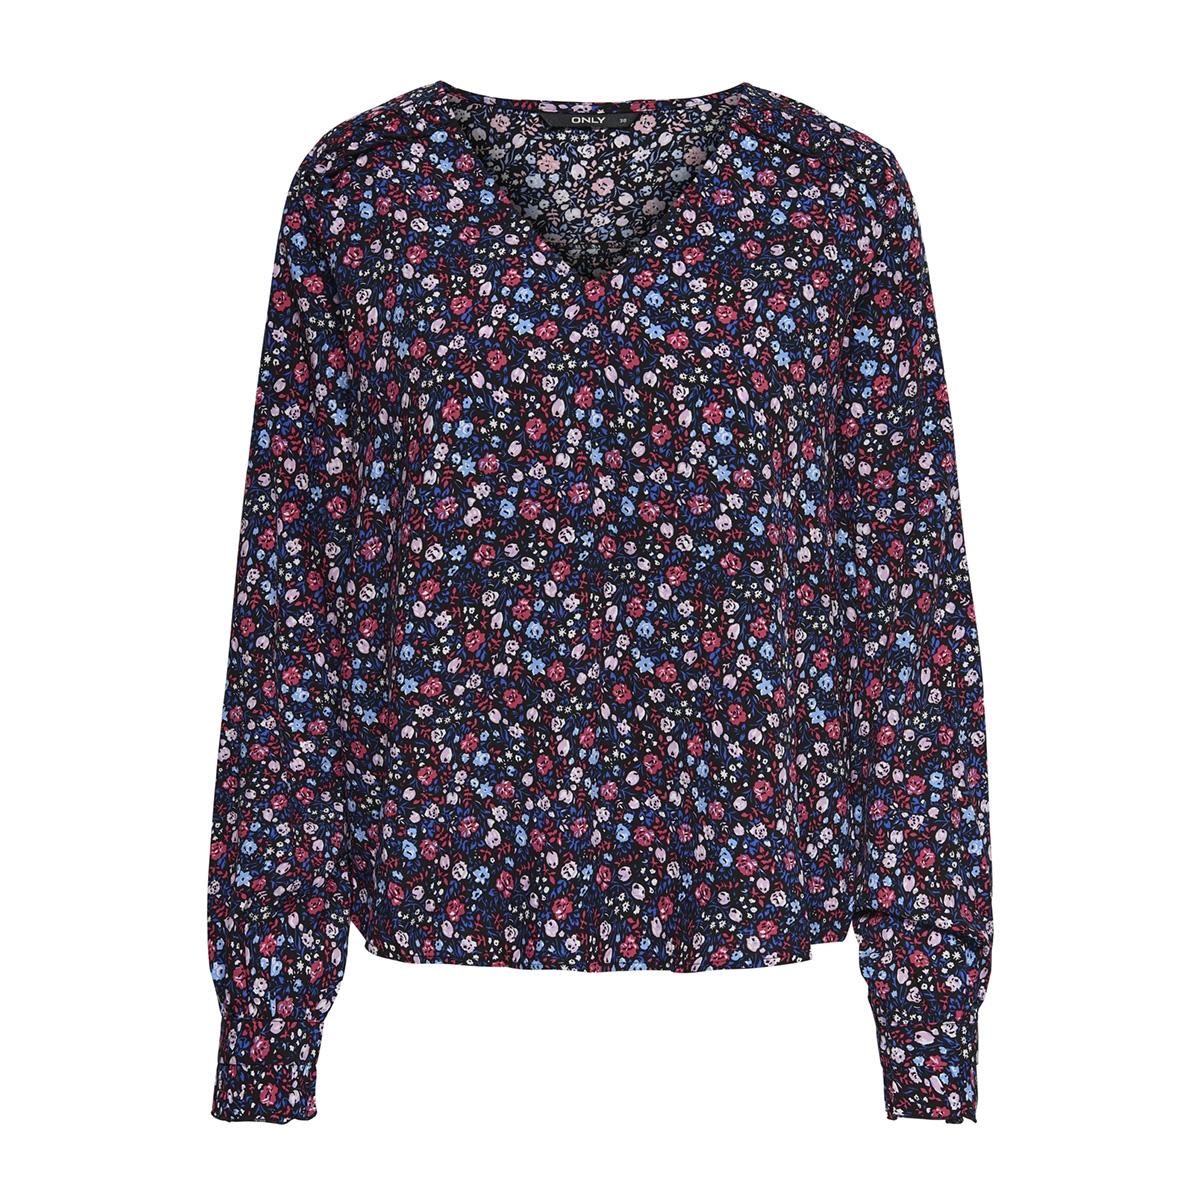 onlmaya ls top wvn 15171877 only blouse black/ditsy flower